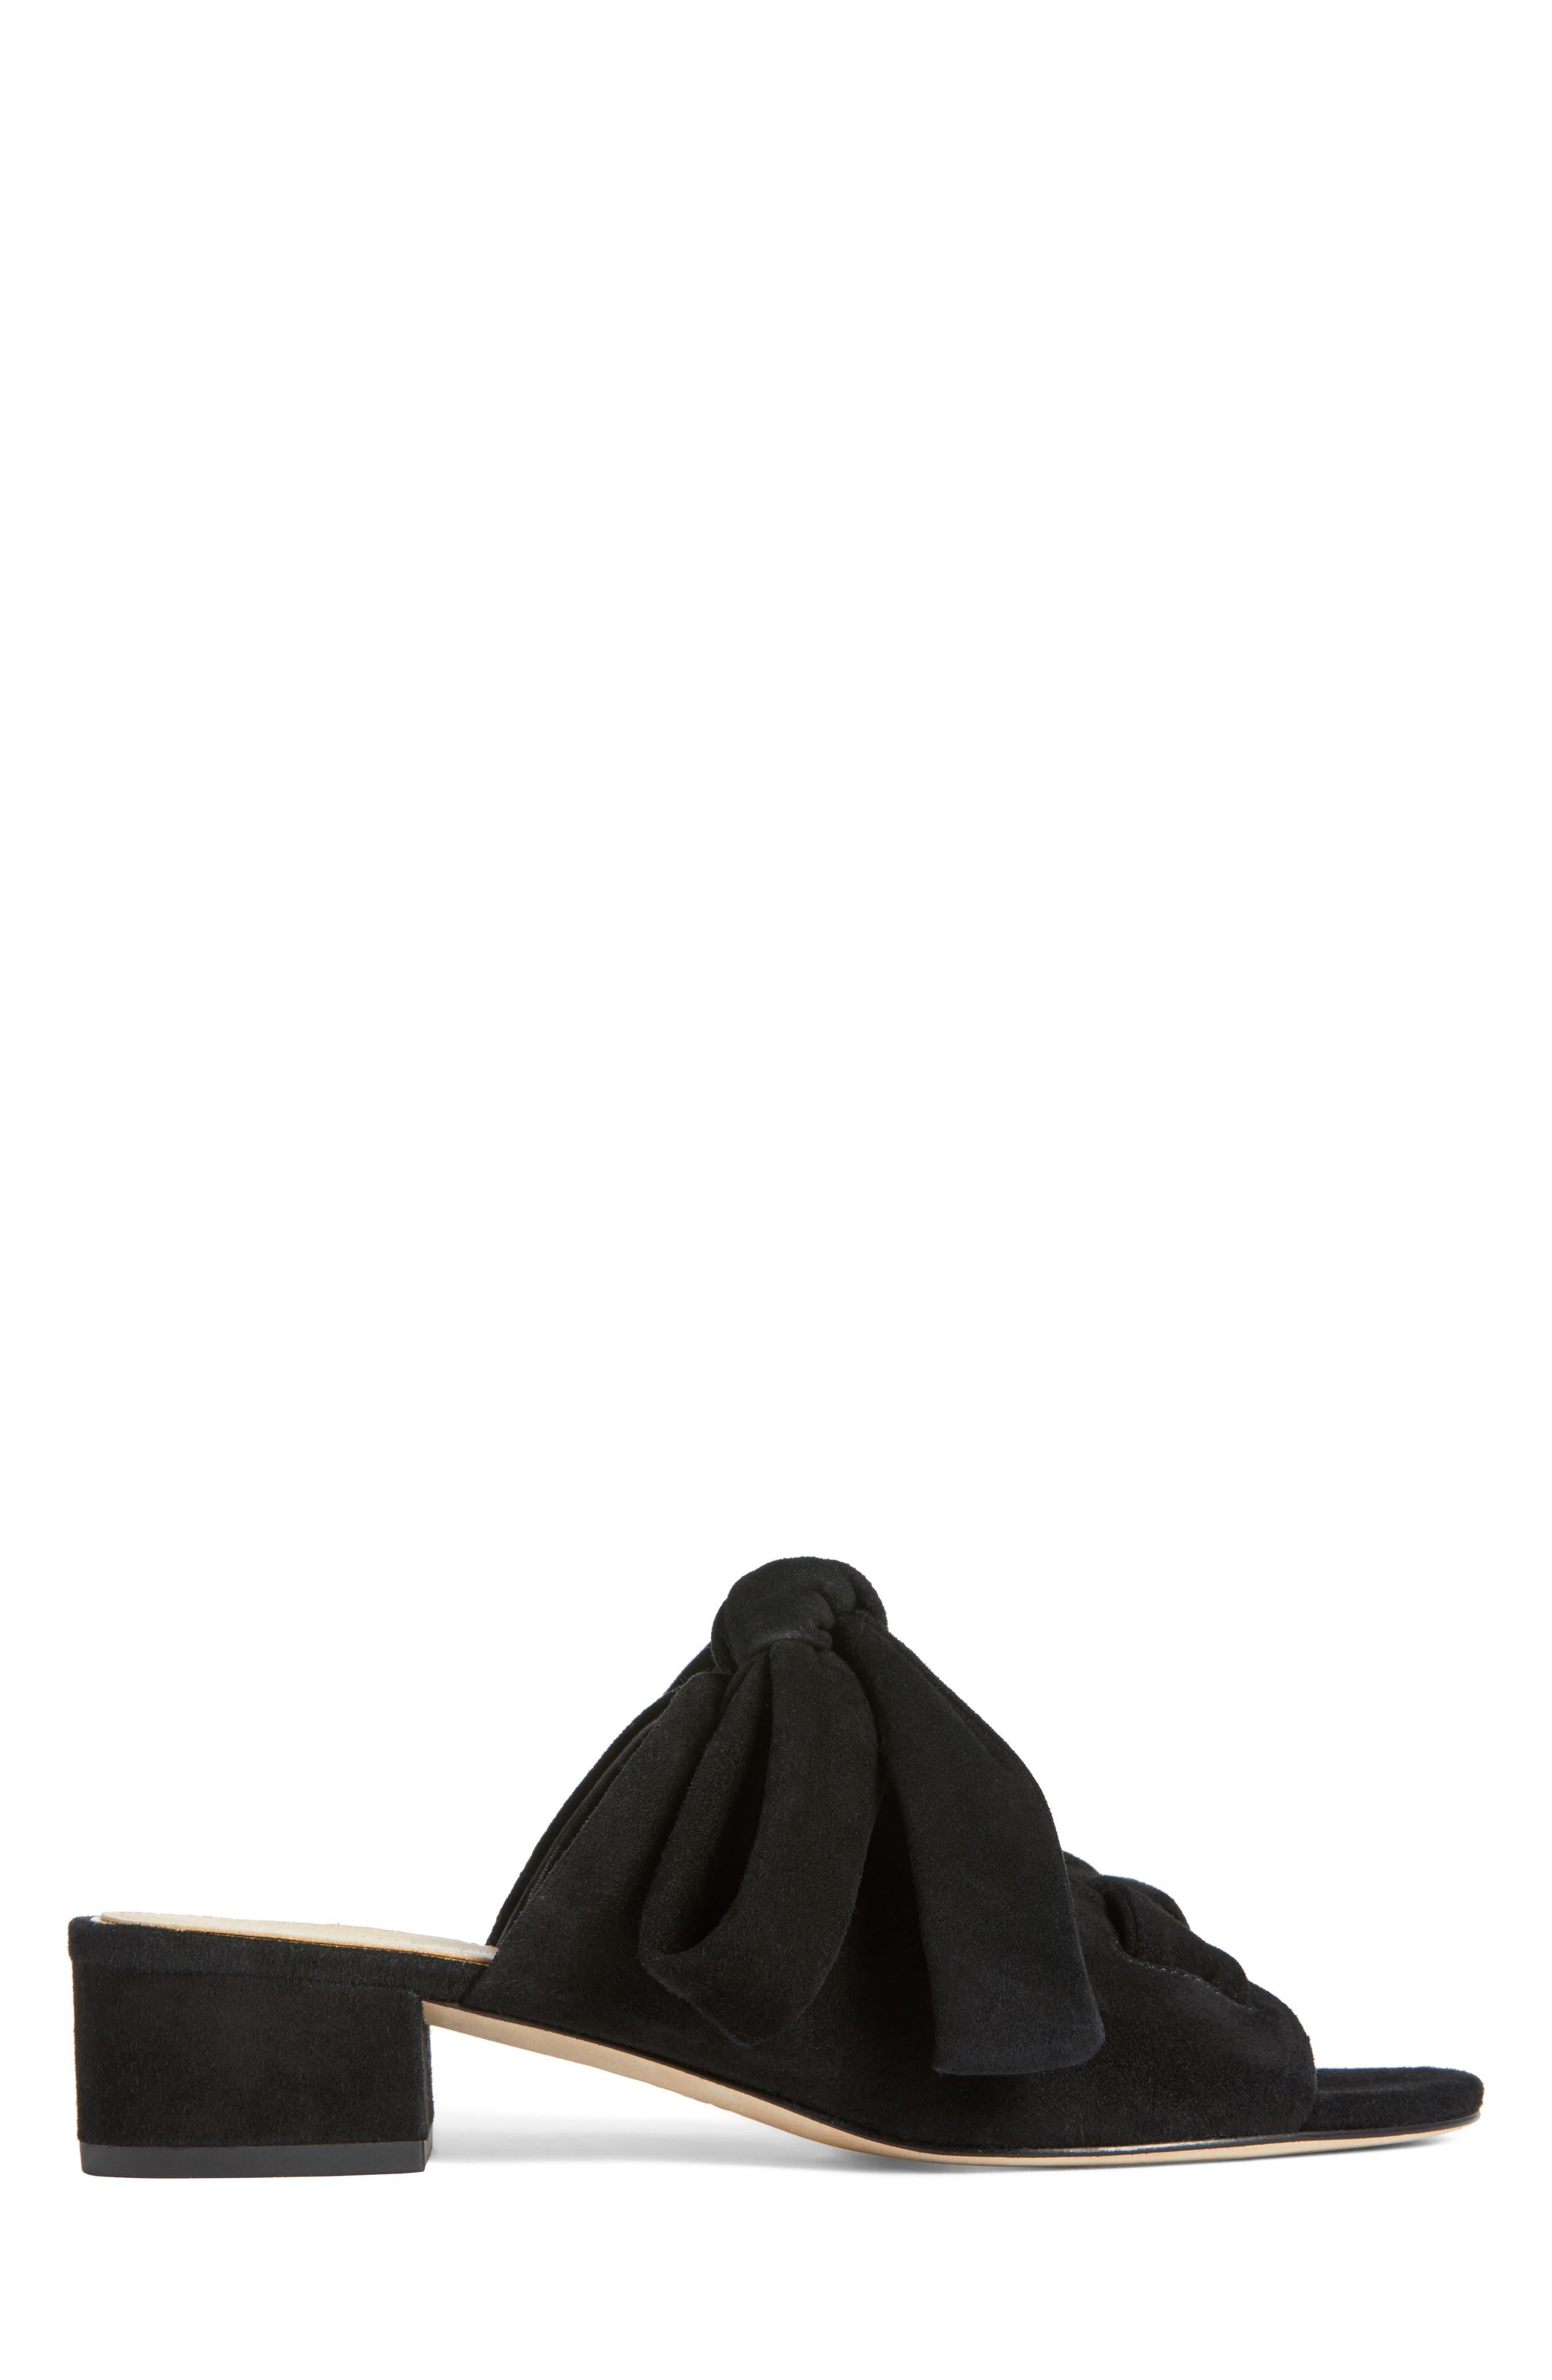 Bermuda Sandal,                             Alternate thumbnail 3, color,                             Black Suede